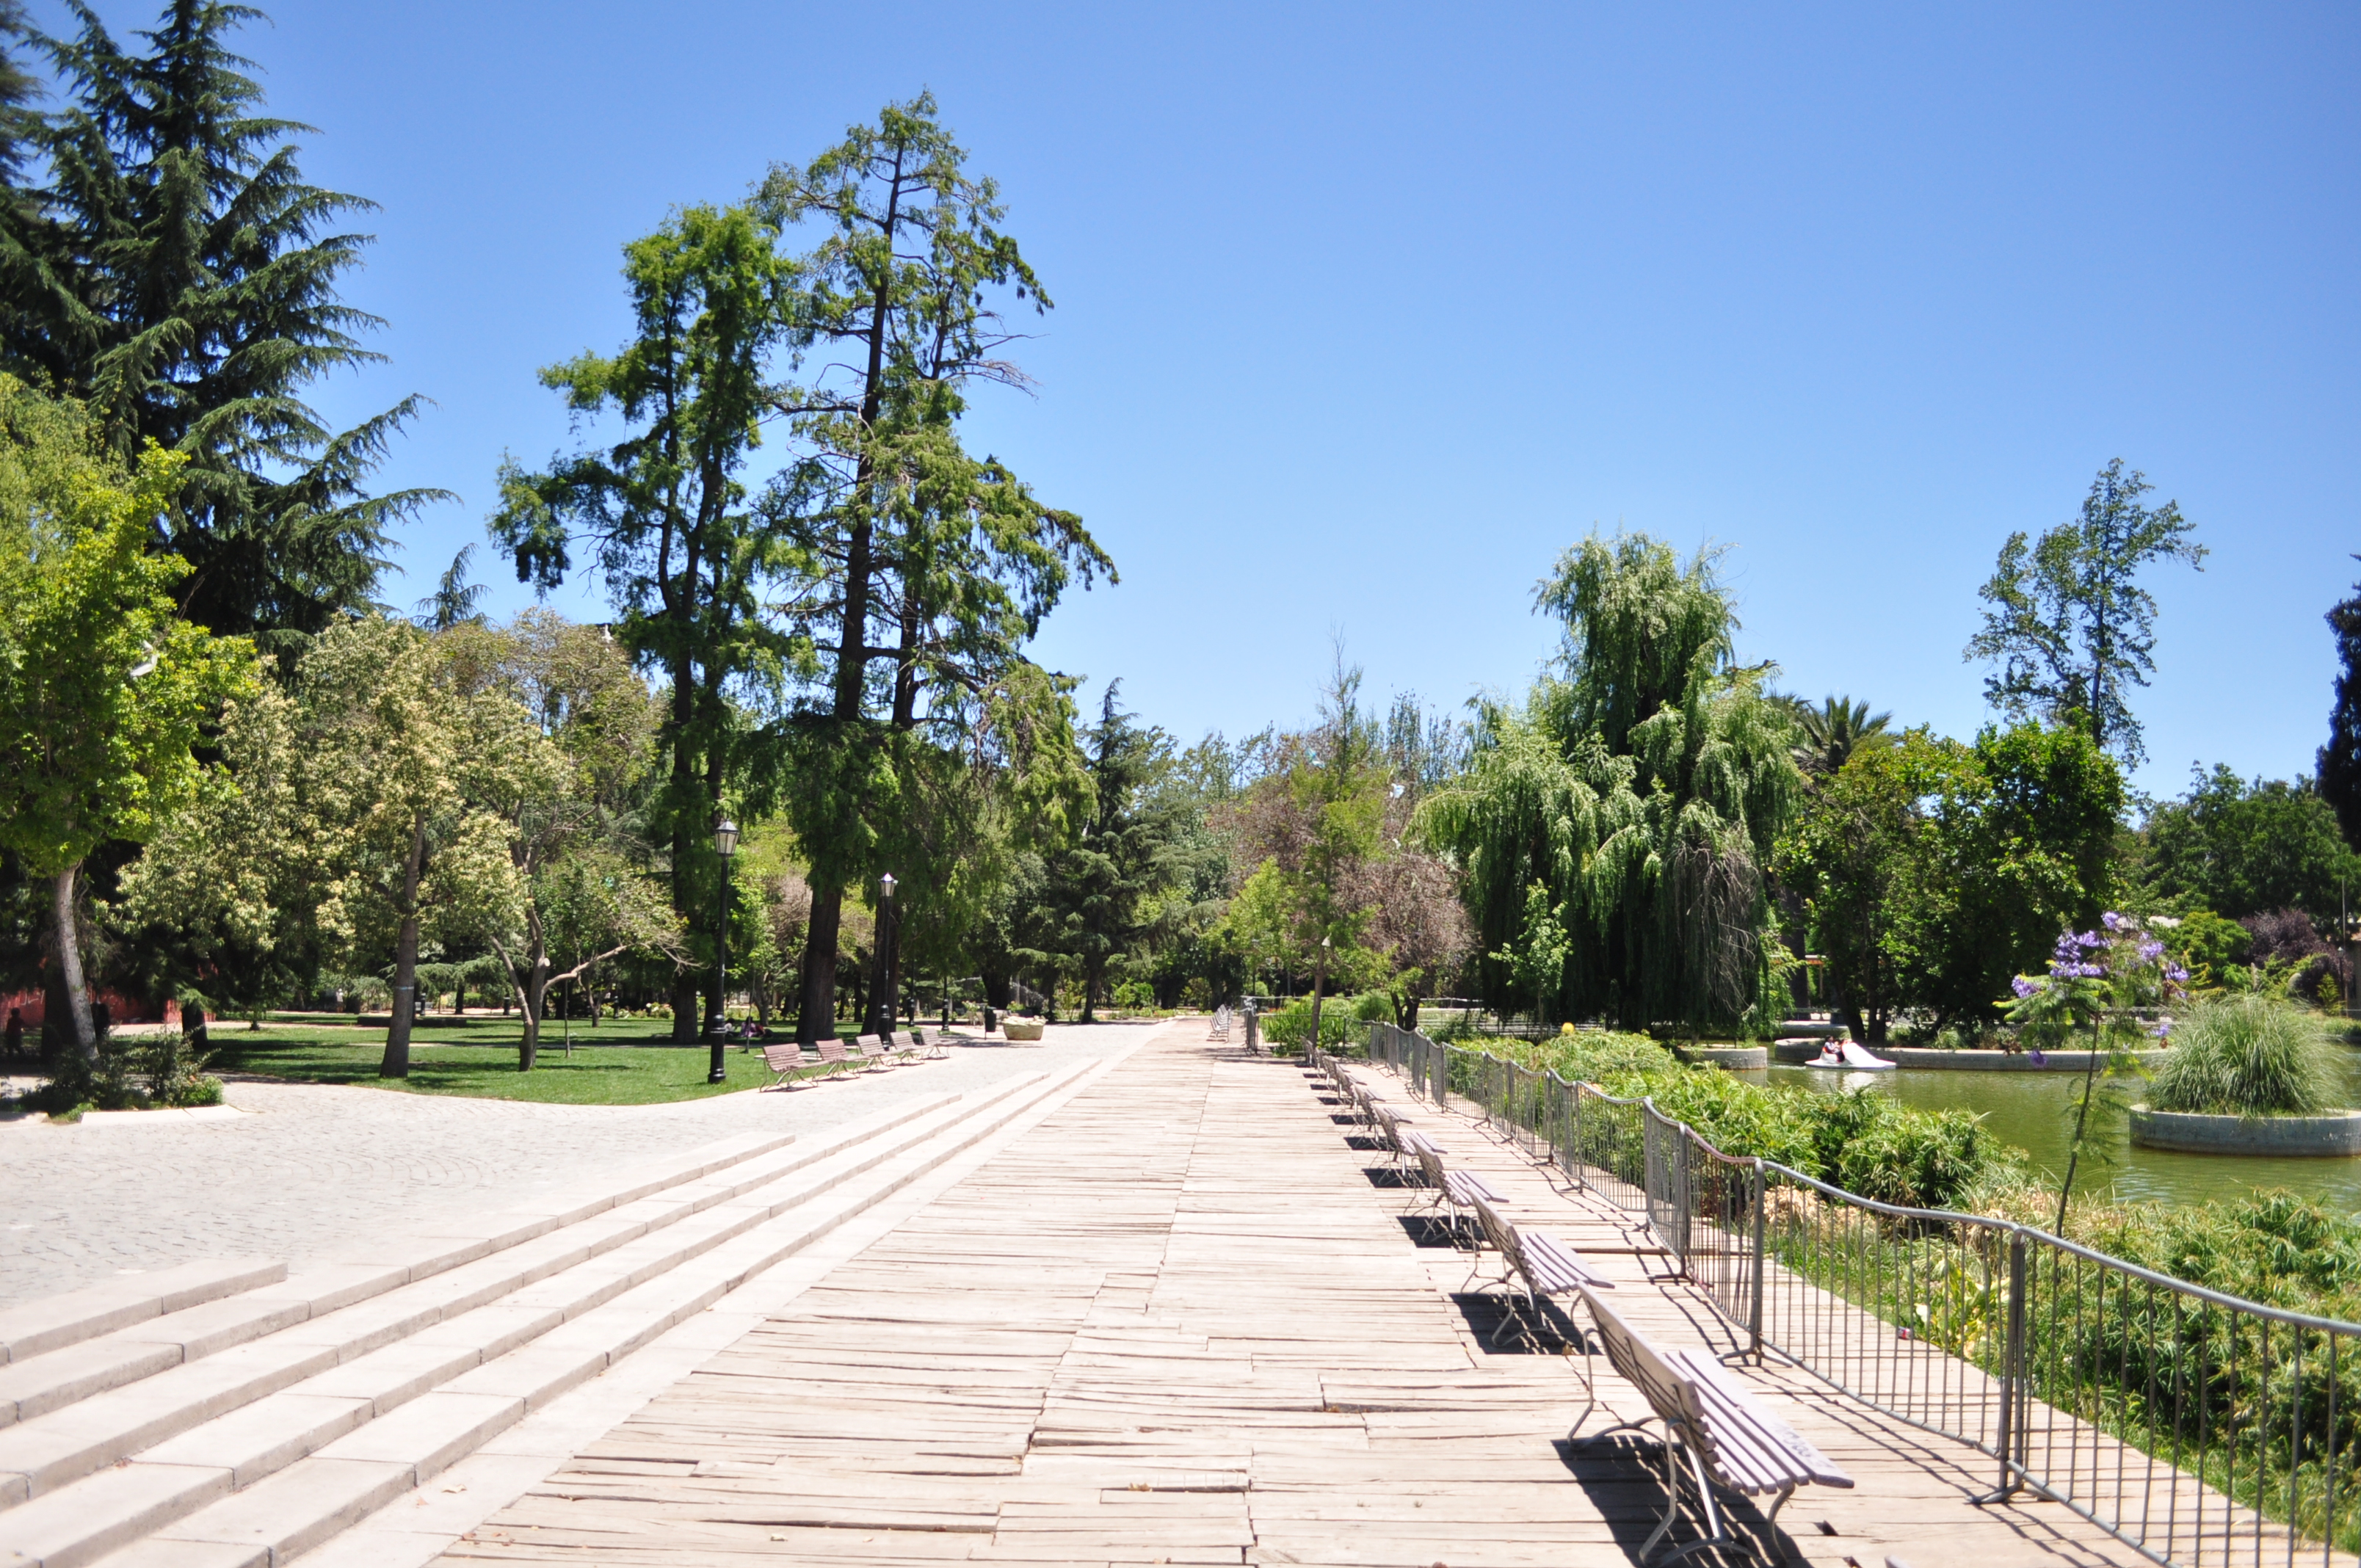 File:Parque Quinta Normal, Santiago de Chile.JPG - Wikimedia Commons